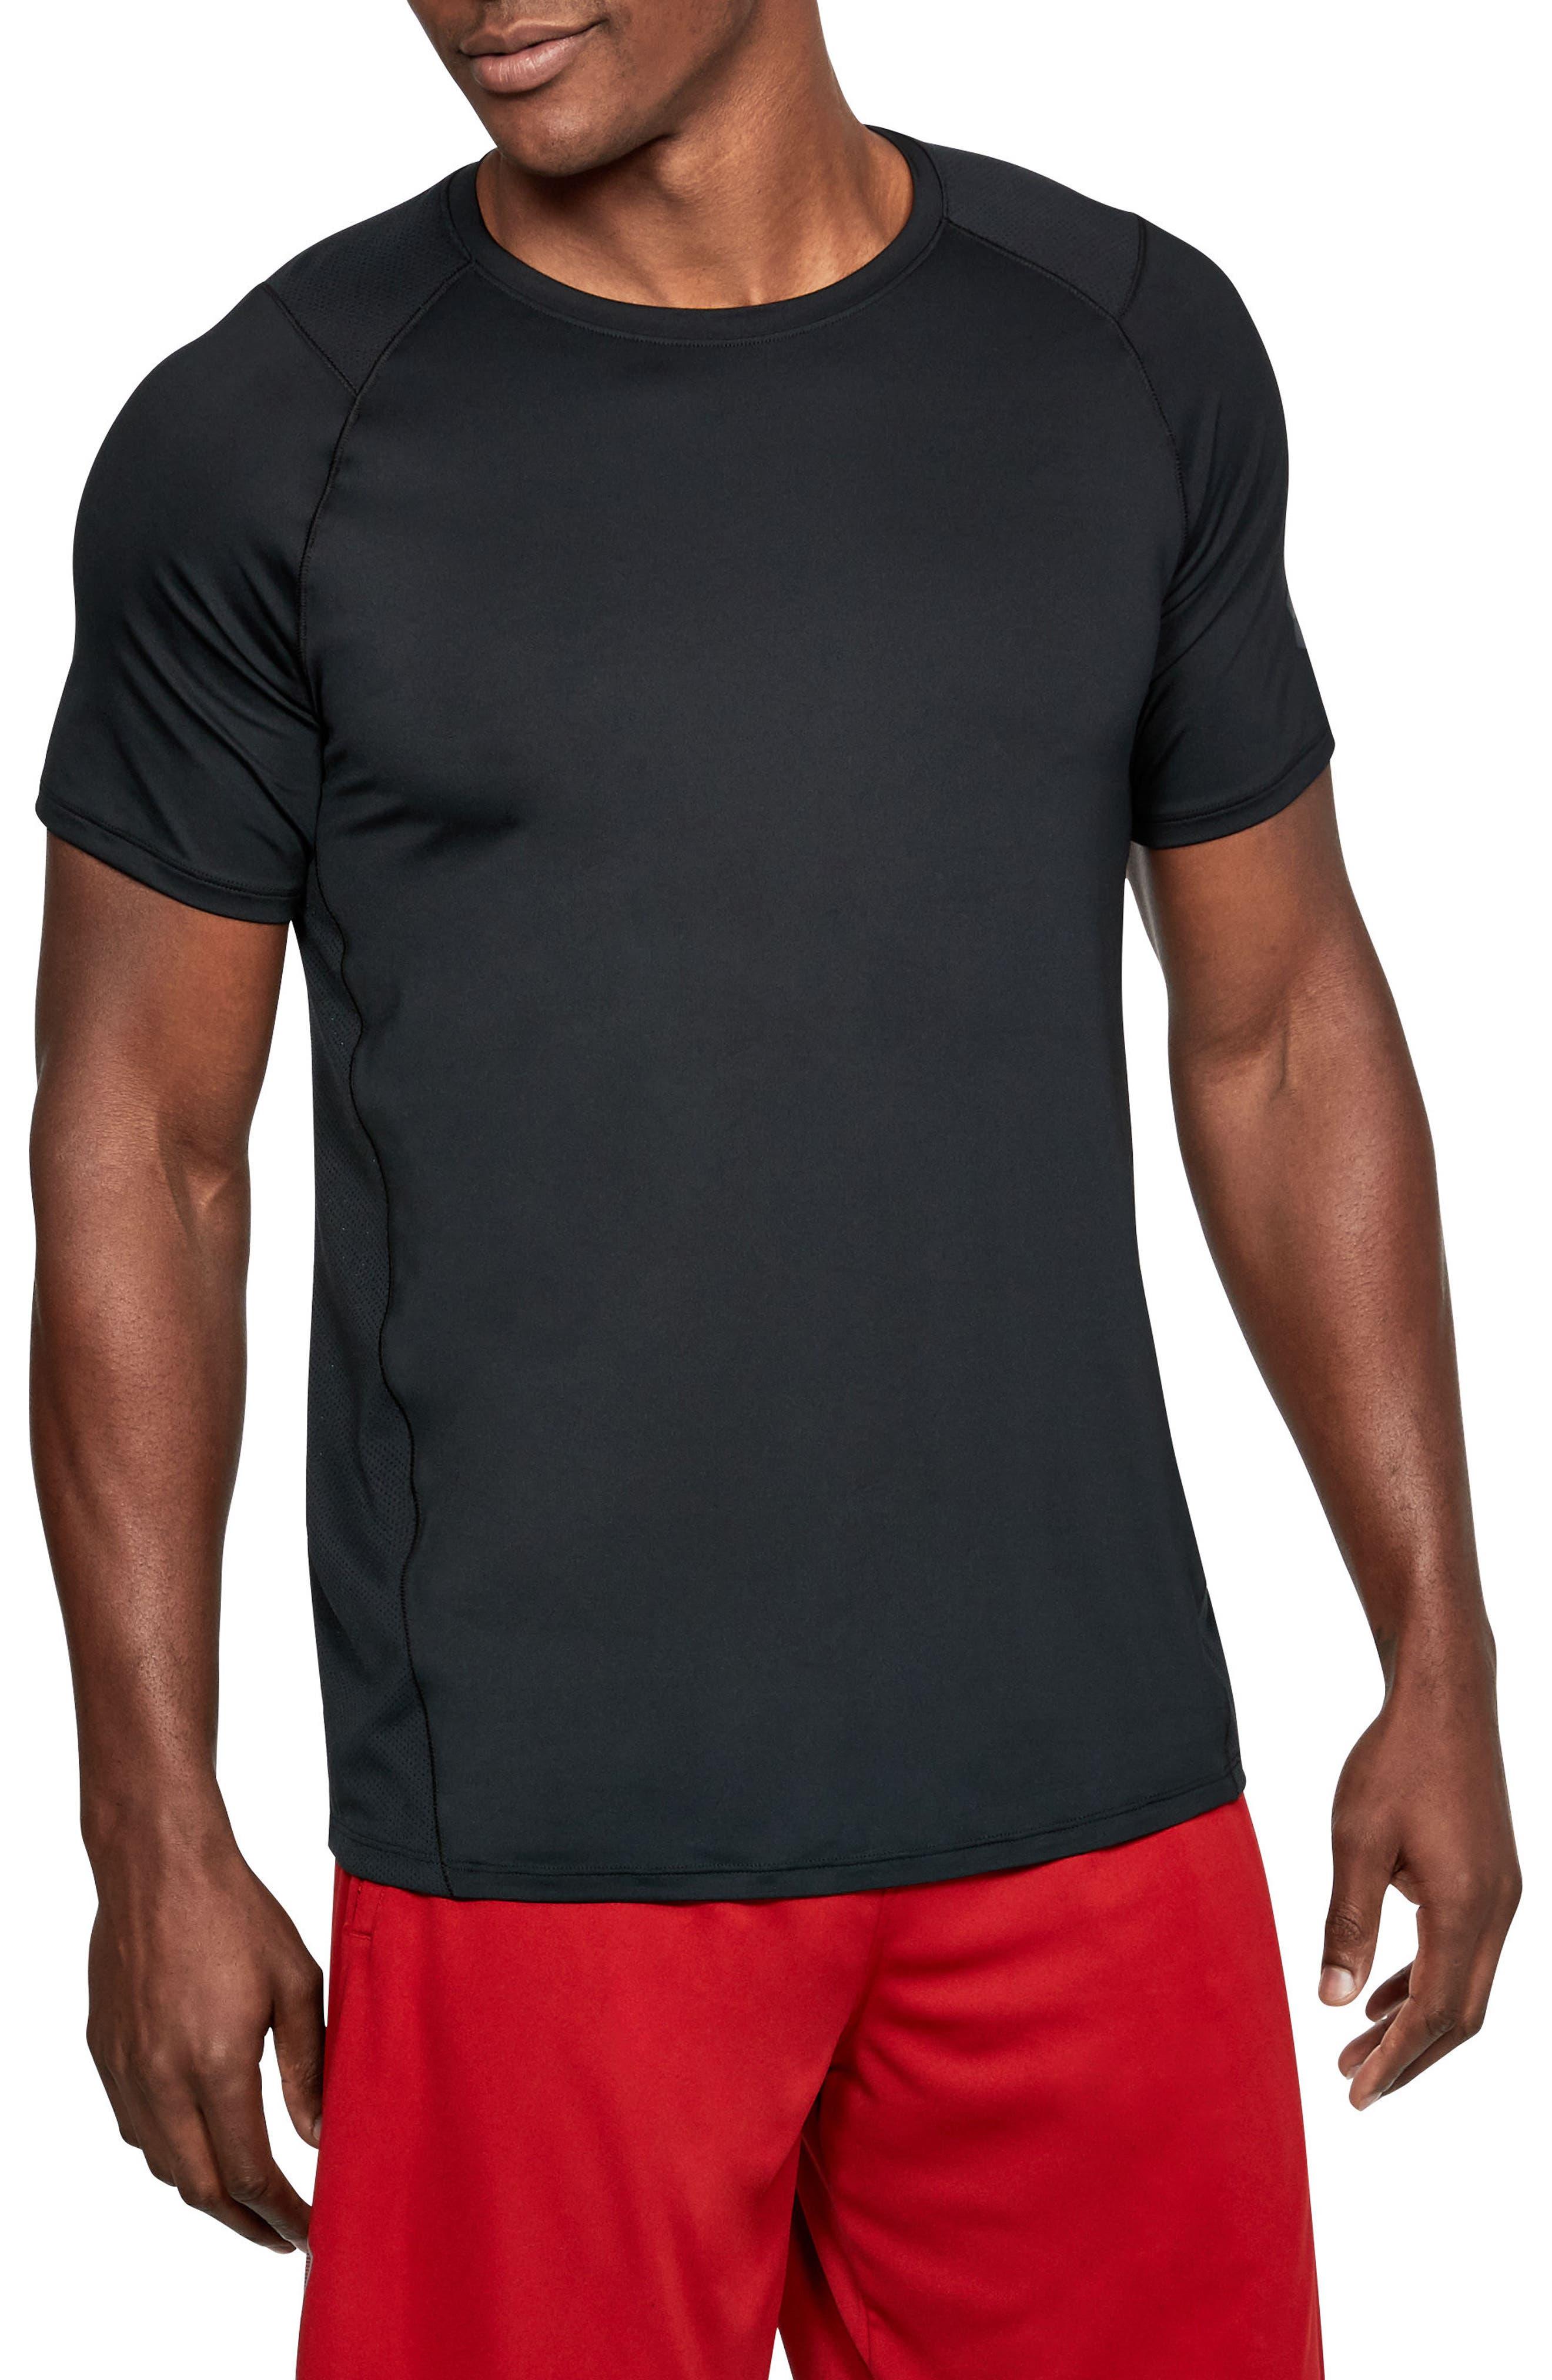 Raid 2.0 Crewneck T-Shirt,                         Main,                         color, Black/ Stealth Gray